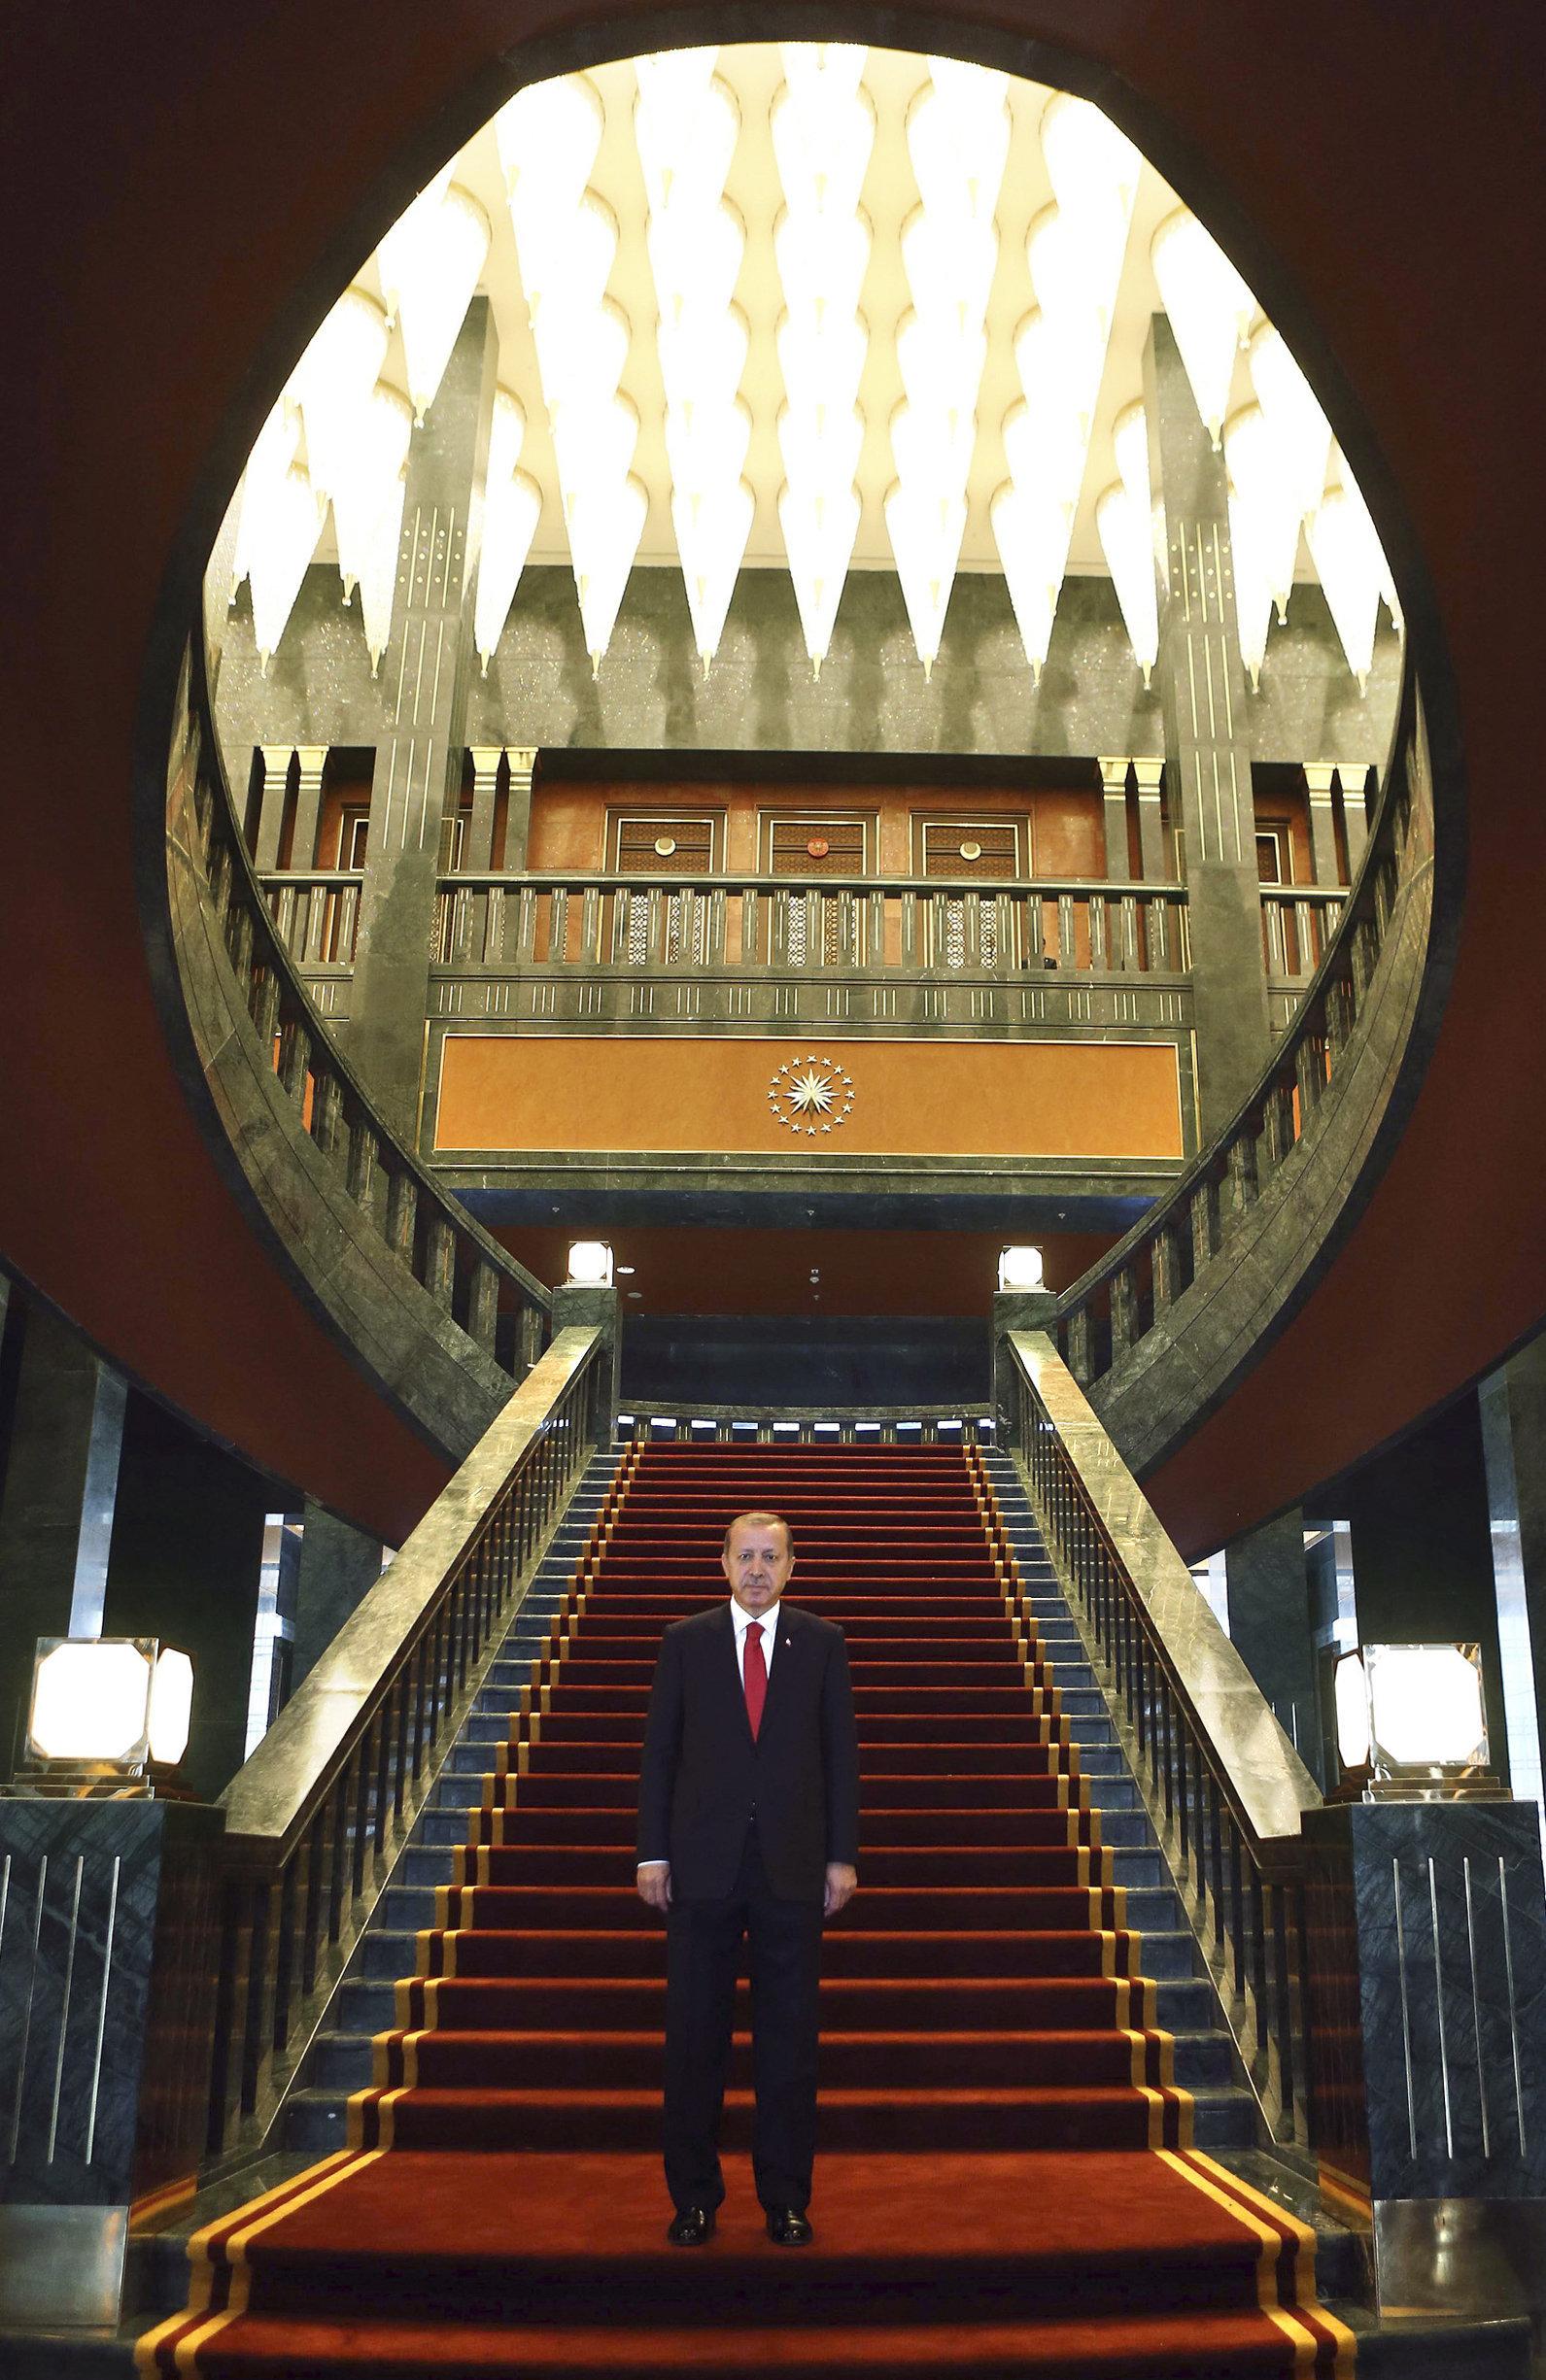 Turkish President Recep Tayyip Erdogan poses inside the new Ak Saray presidential palace (White Palace) on the outskirts of Ankara (File)